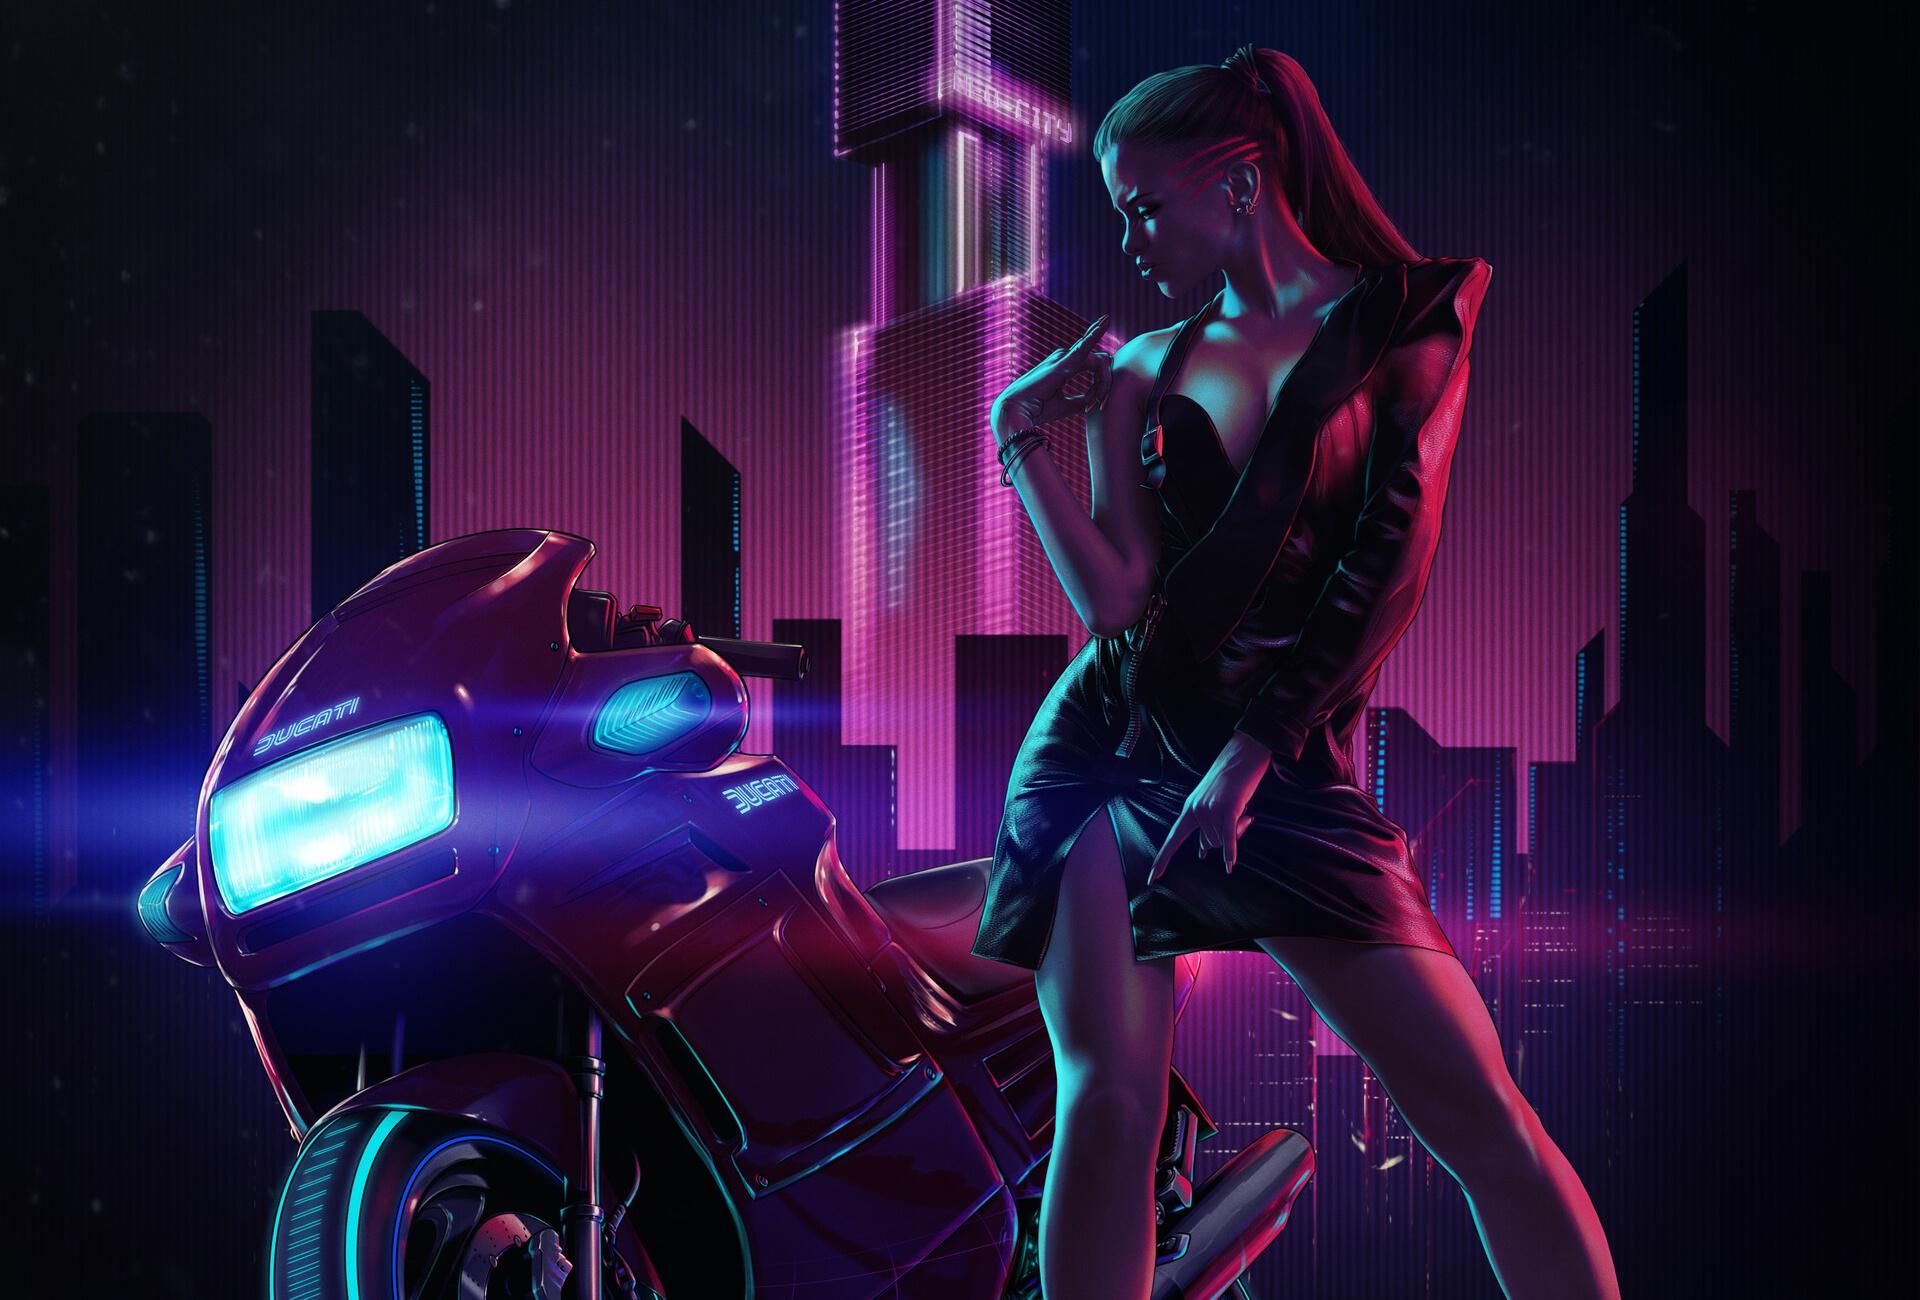 General 1920x1300 neon vehicle artwork women Ducati motorcycle cyberpunk